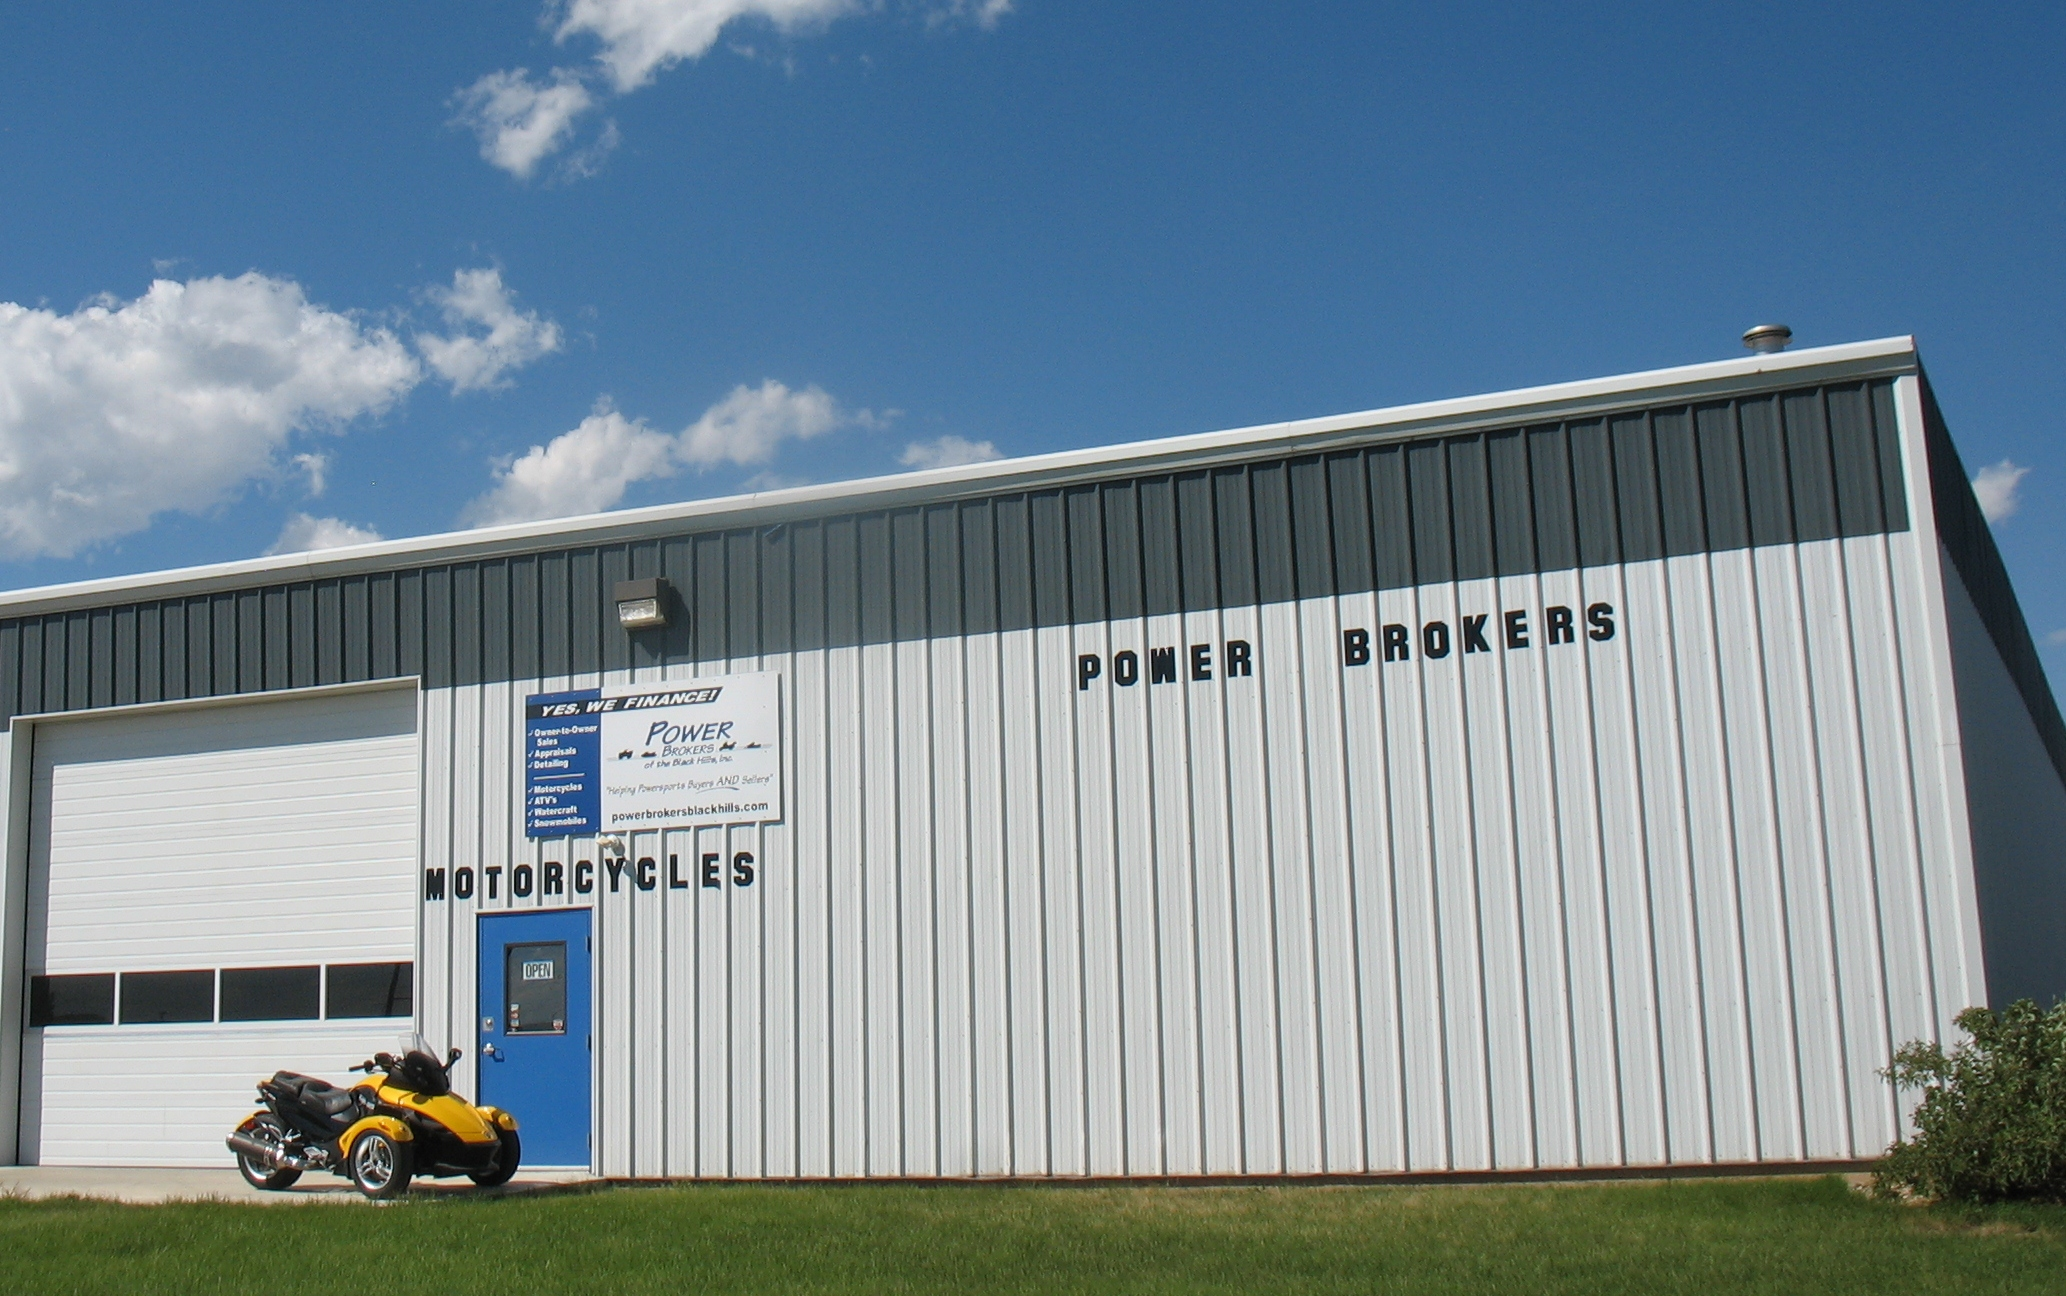 Power Brokers of the Black Hills